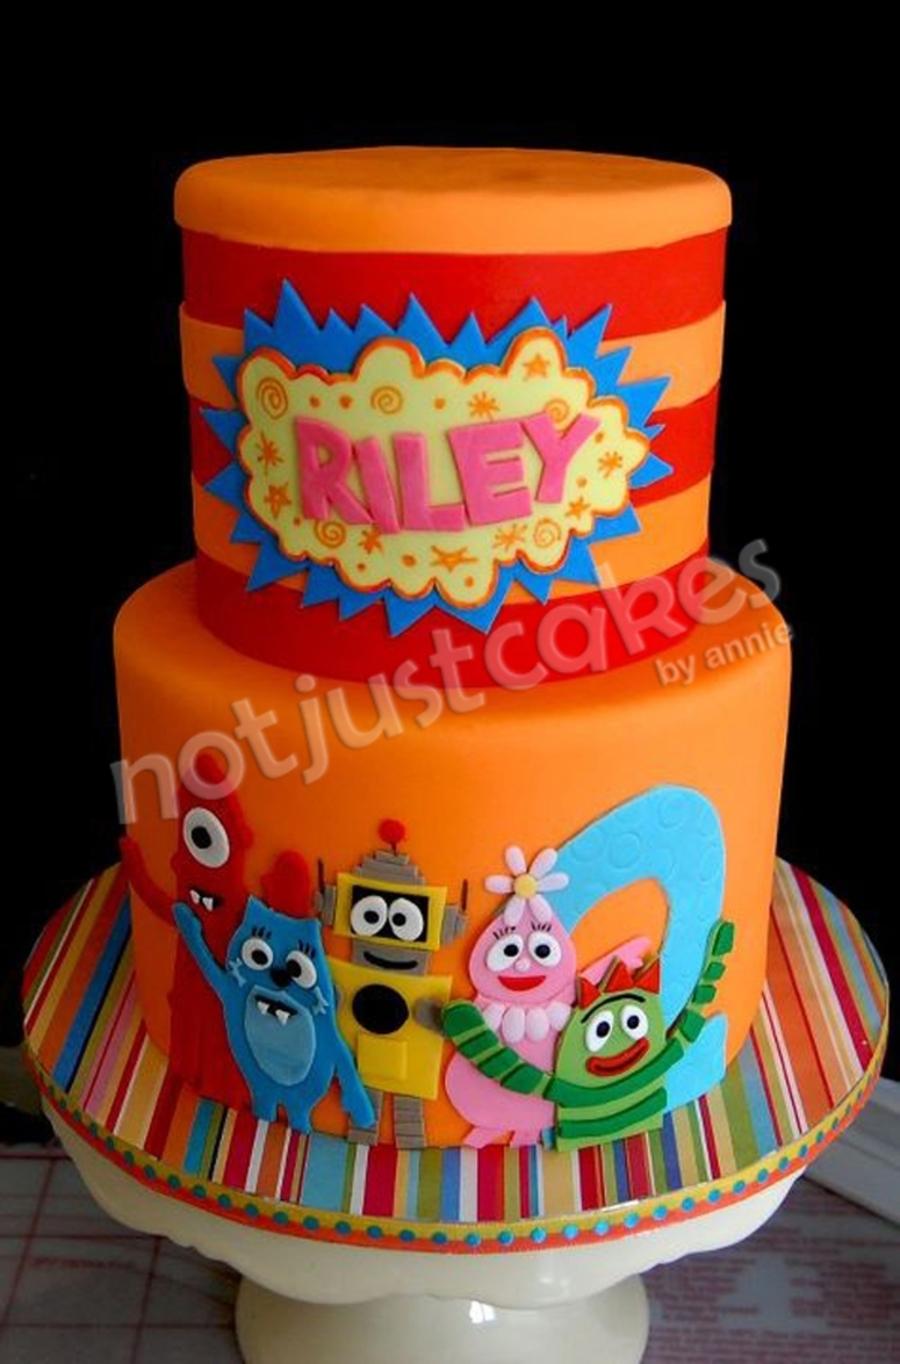 Superb Yo Gabba Gabba Cake And Sweets For Riley Cakecentral Com Funny Birthday Cards Online Elaedamsfinfo